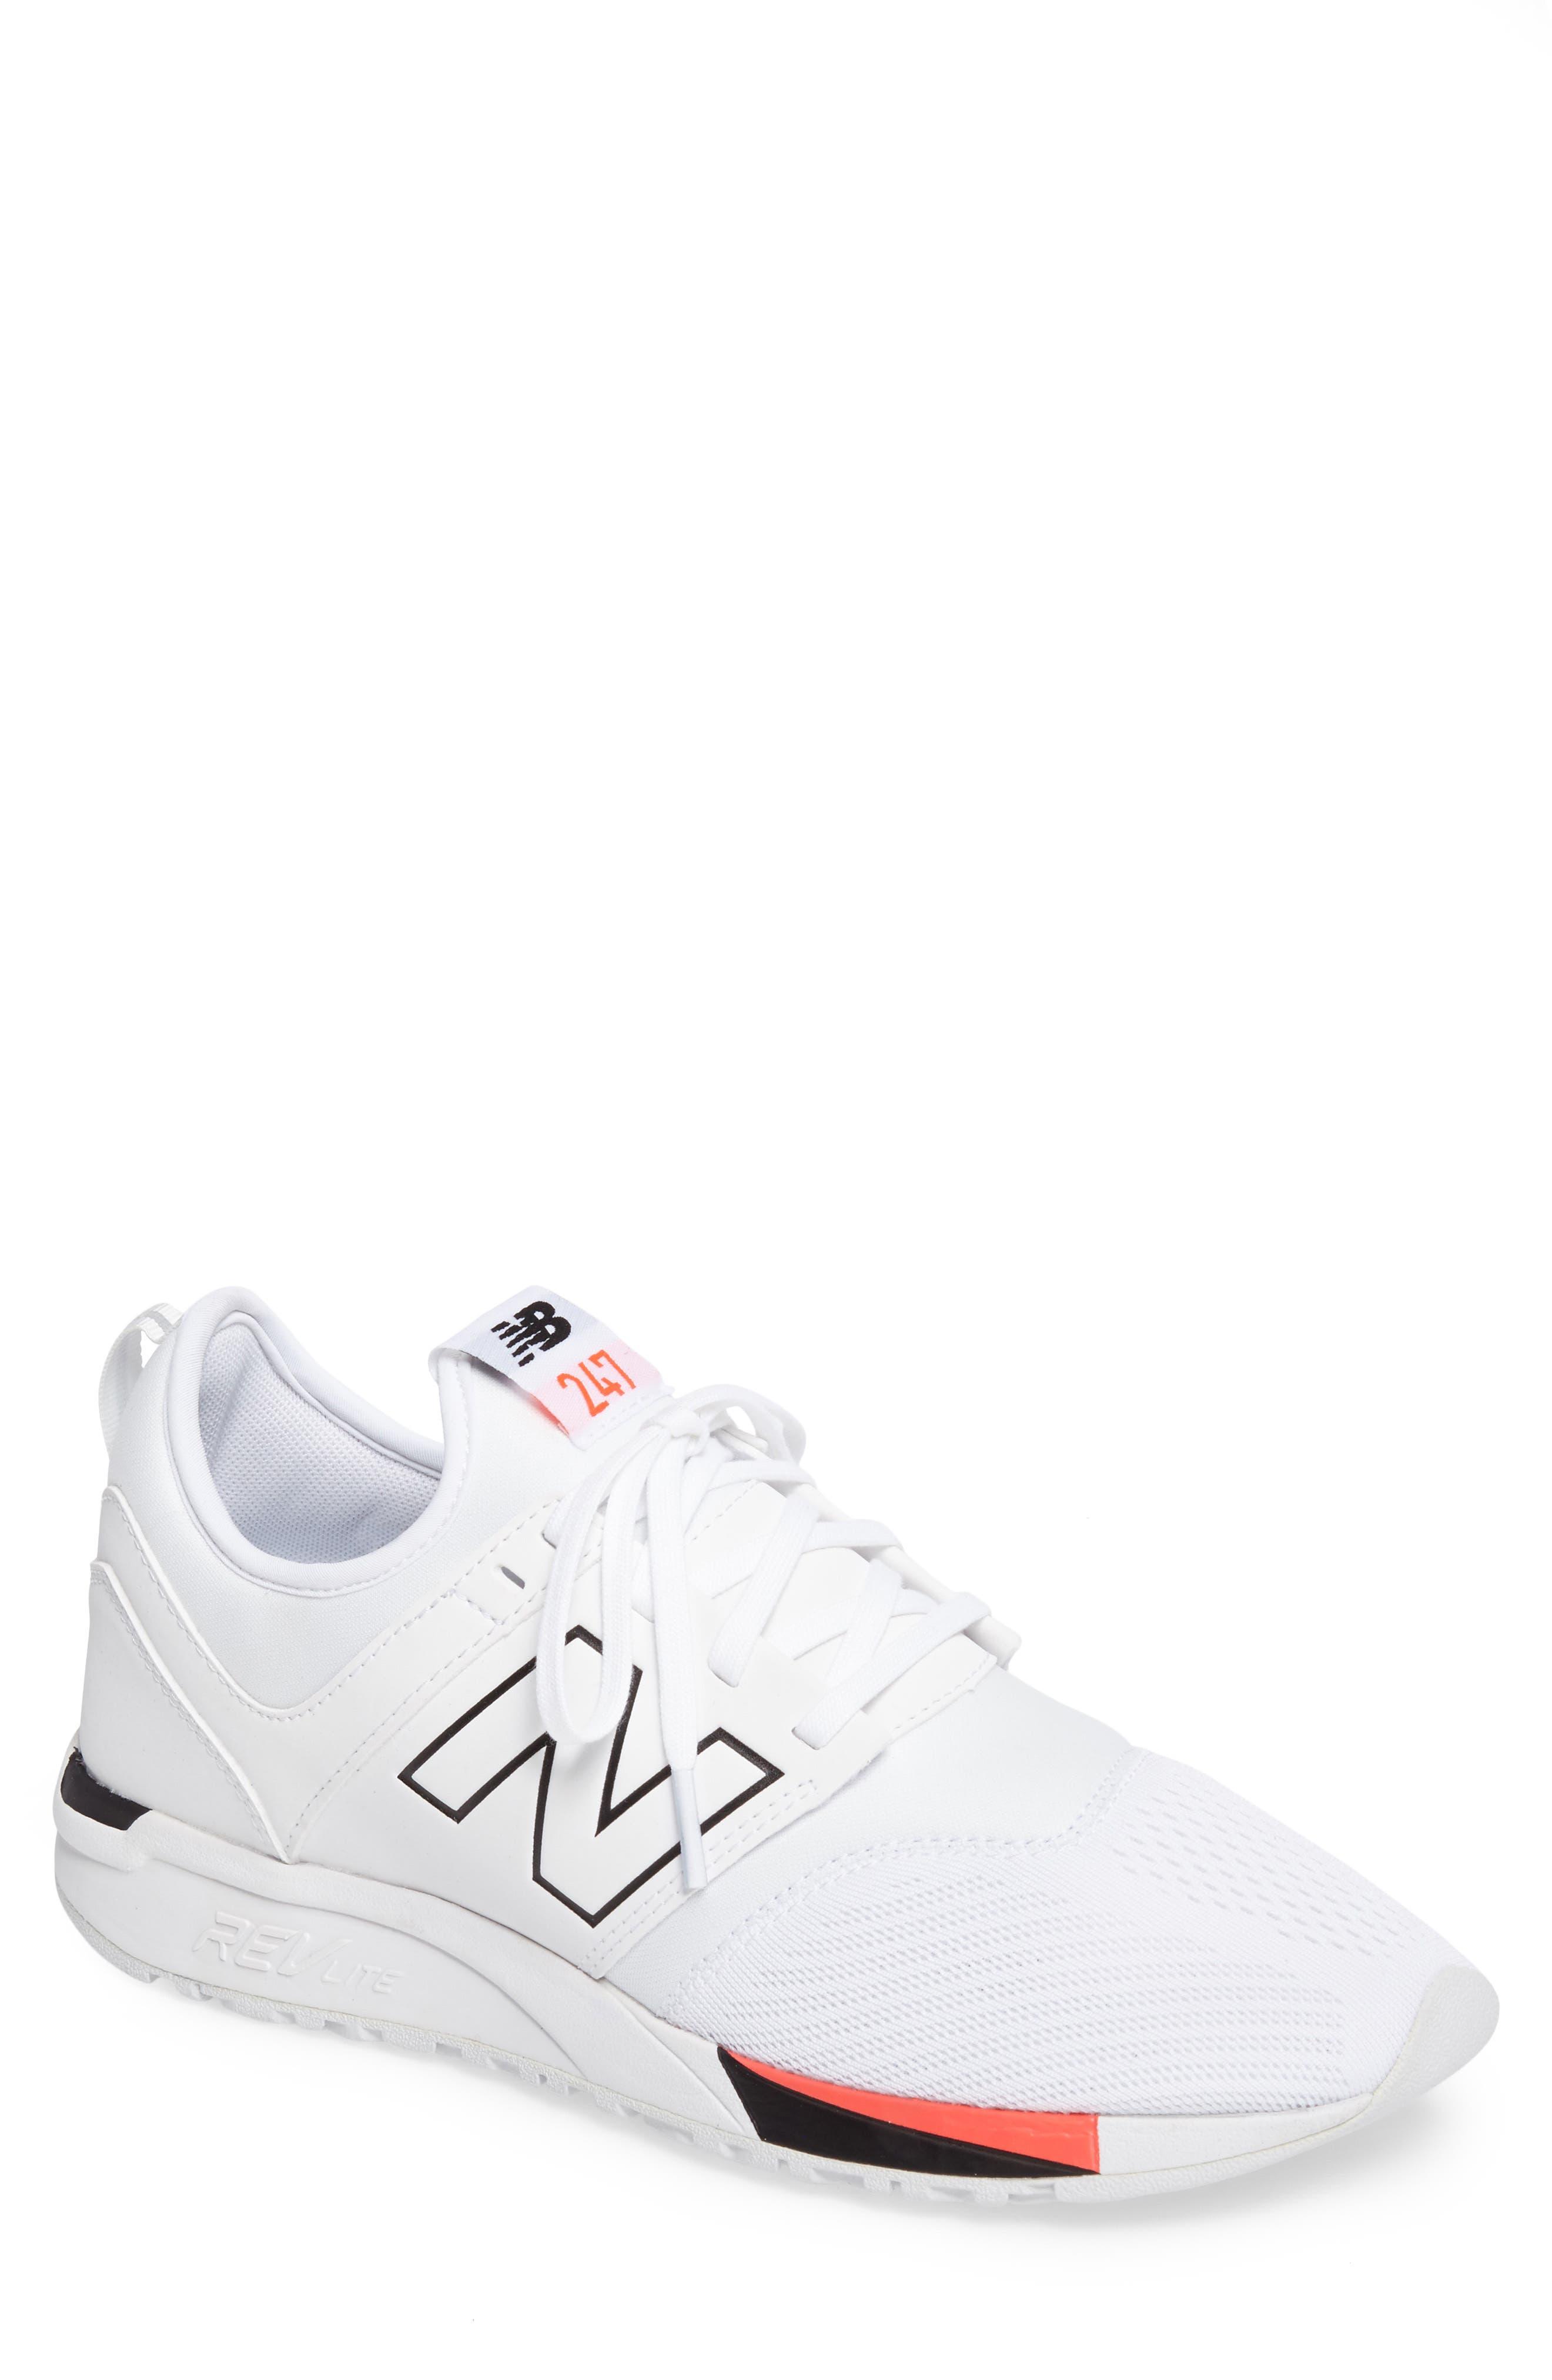 NEW BALANCE 247 Classic Plus Sneaker